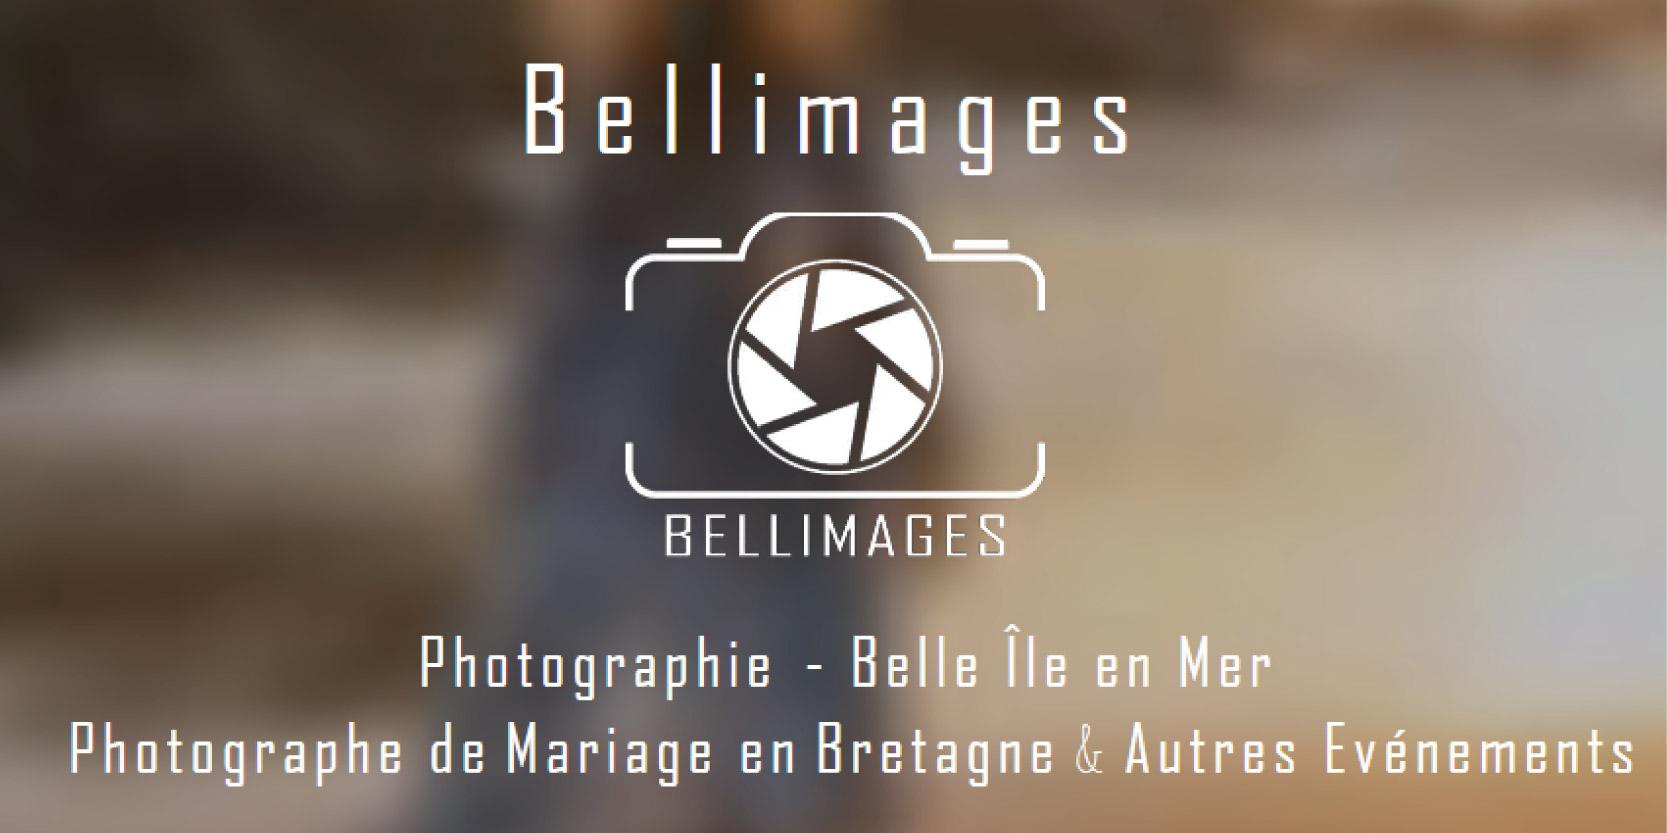 Bellimages - Fabien Giordano - Photographe Belle Île en Mer-01